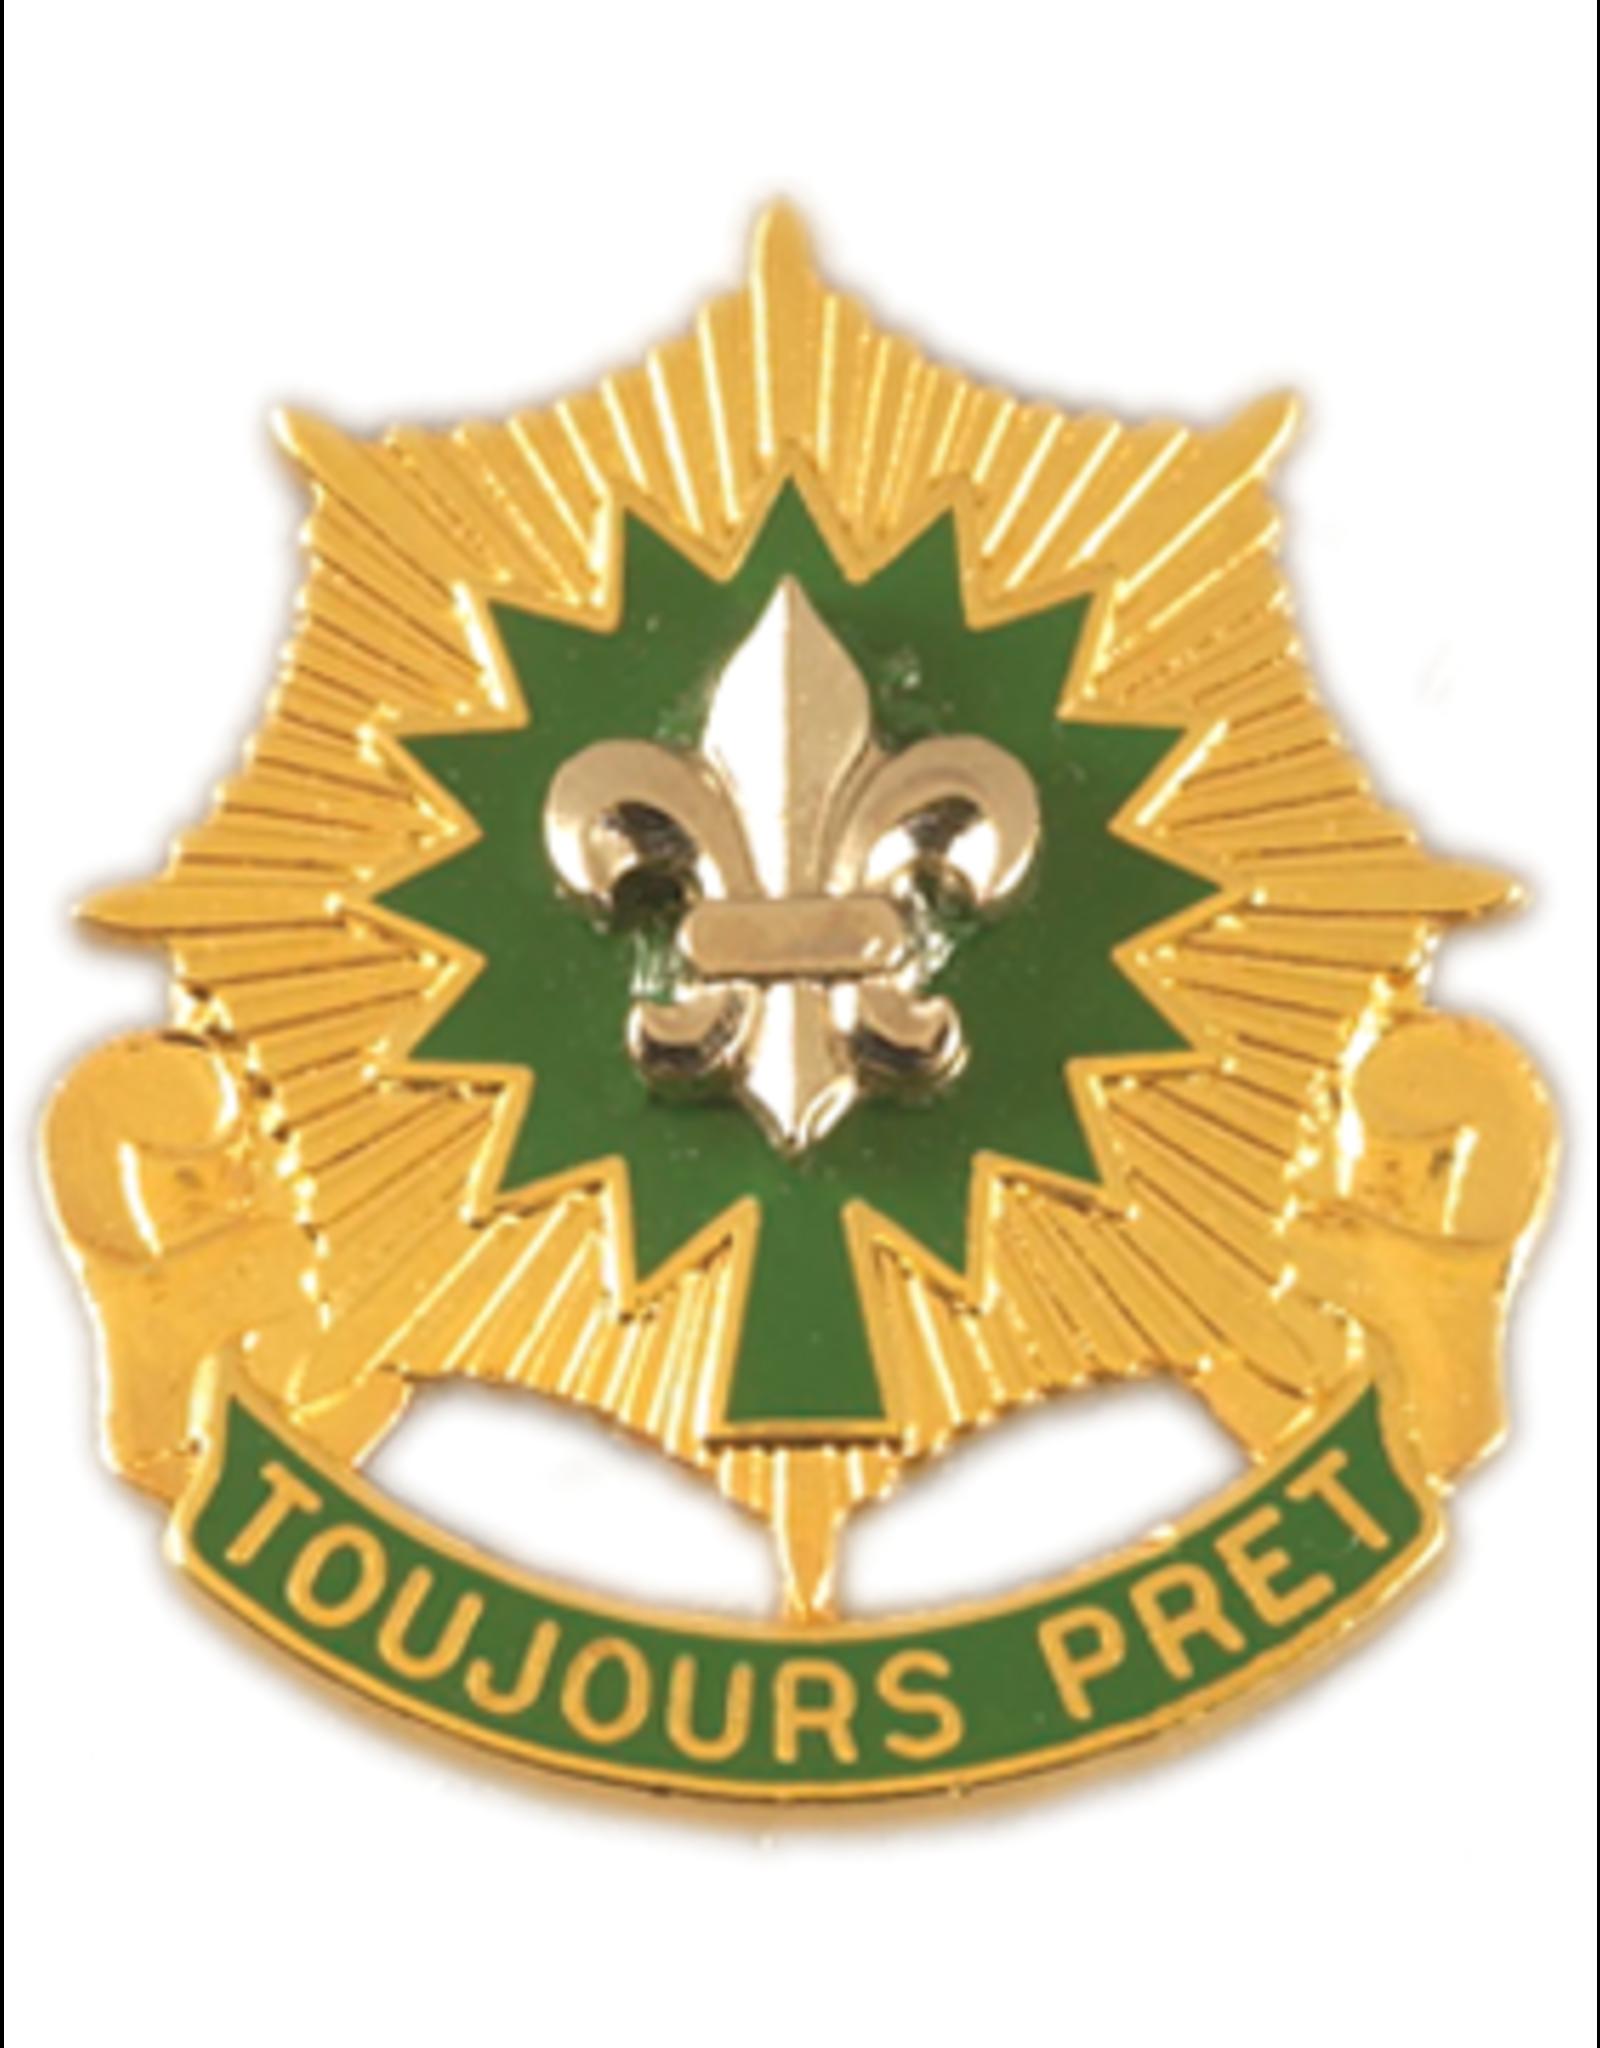 2nd Armored Cavalry Regiement Unit Crest - Toujours Pret